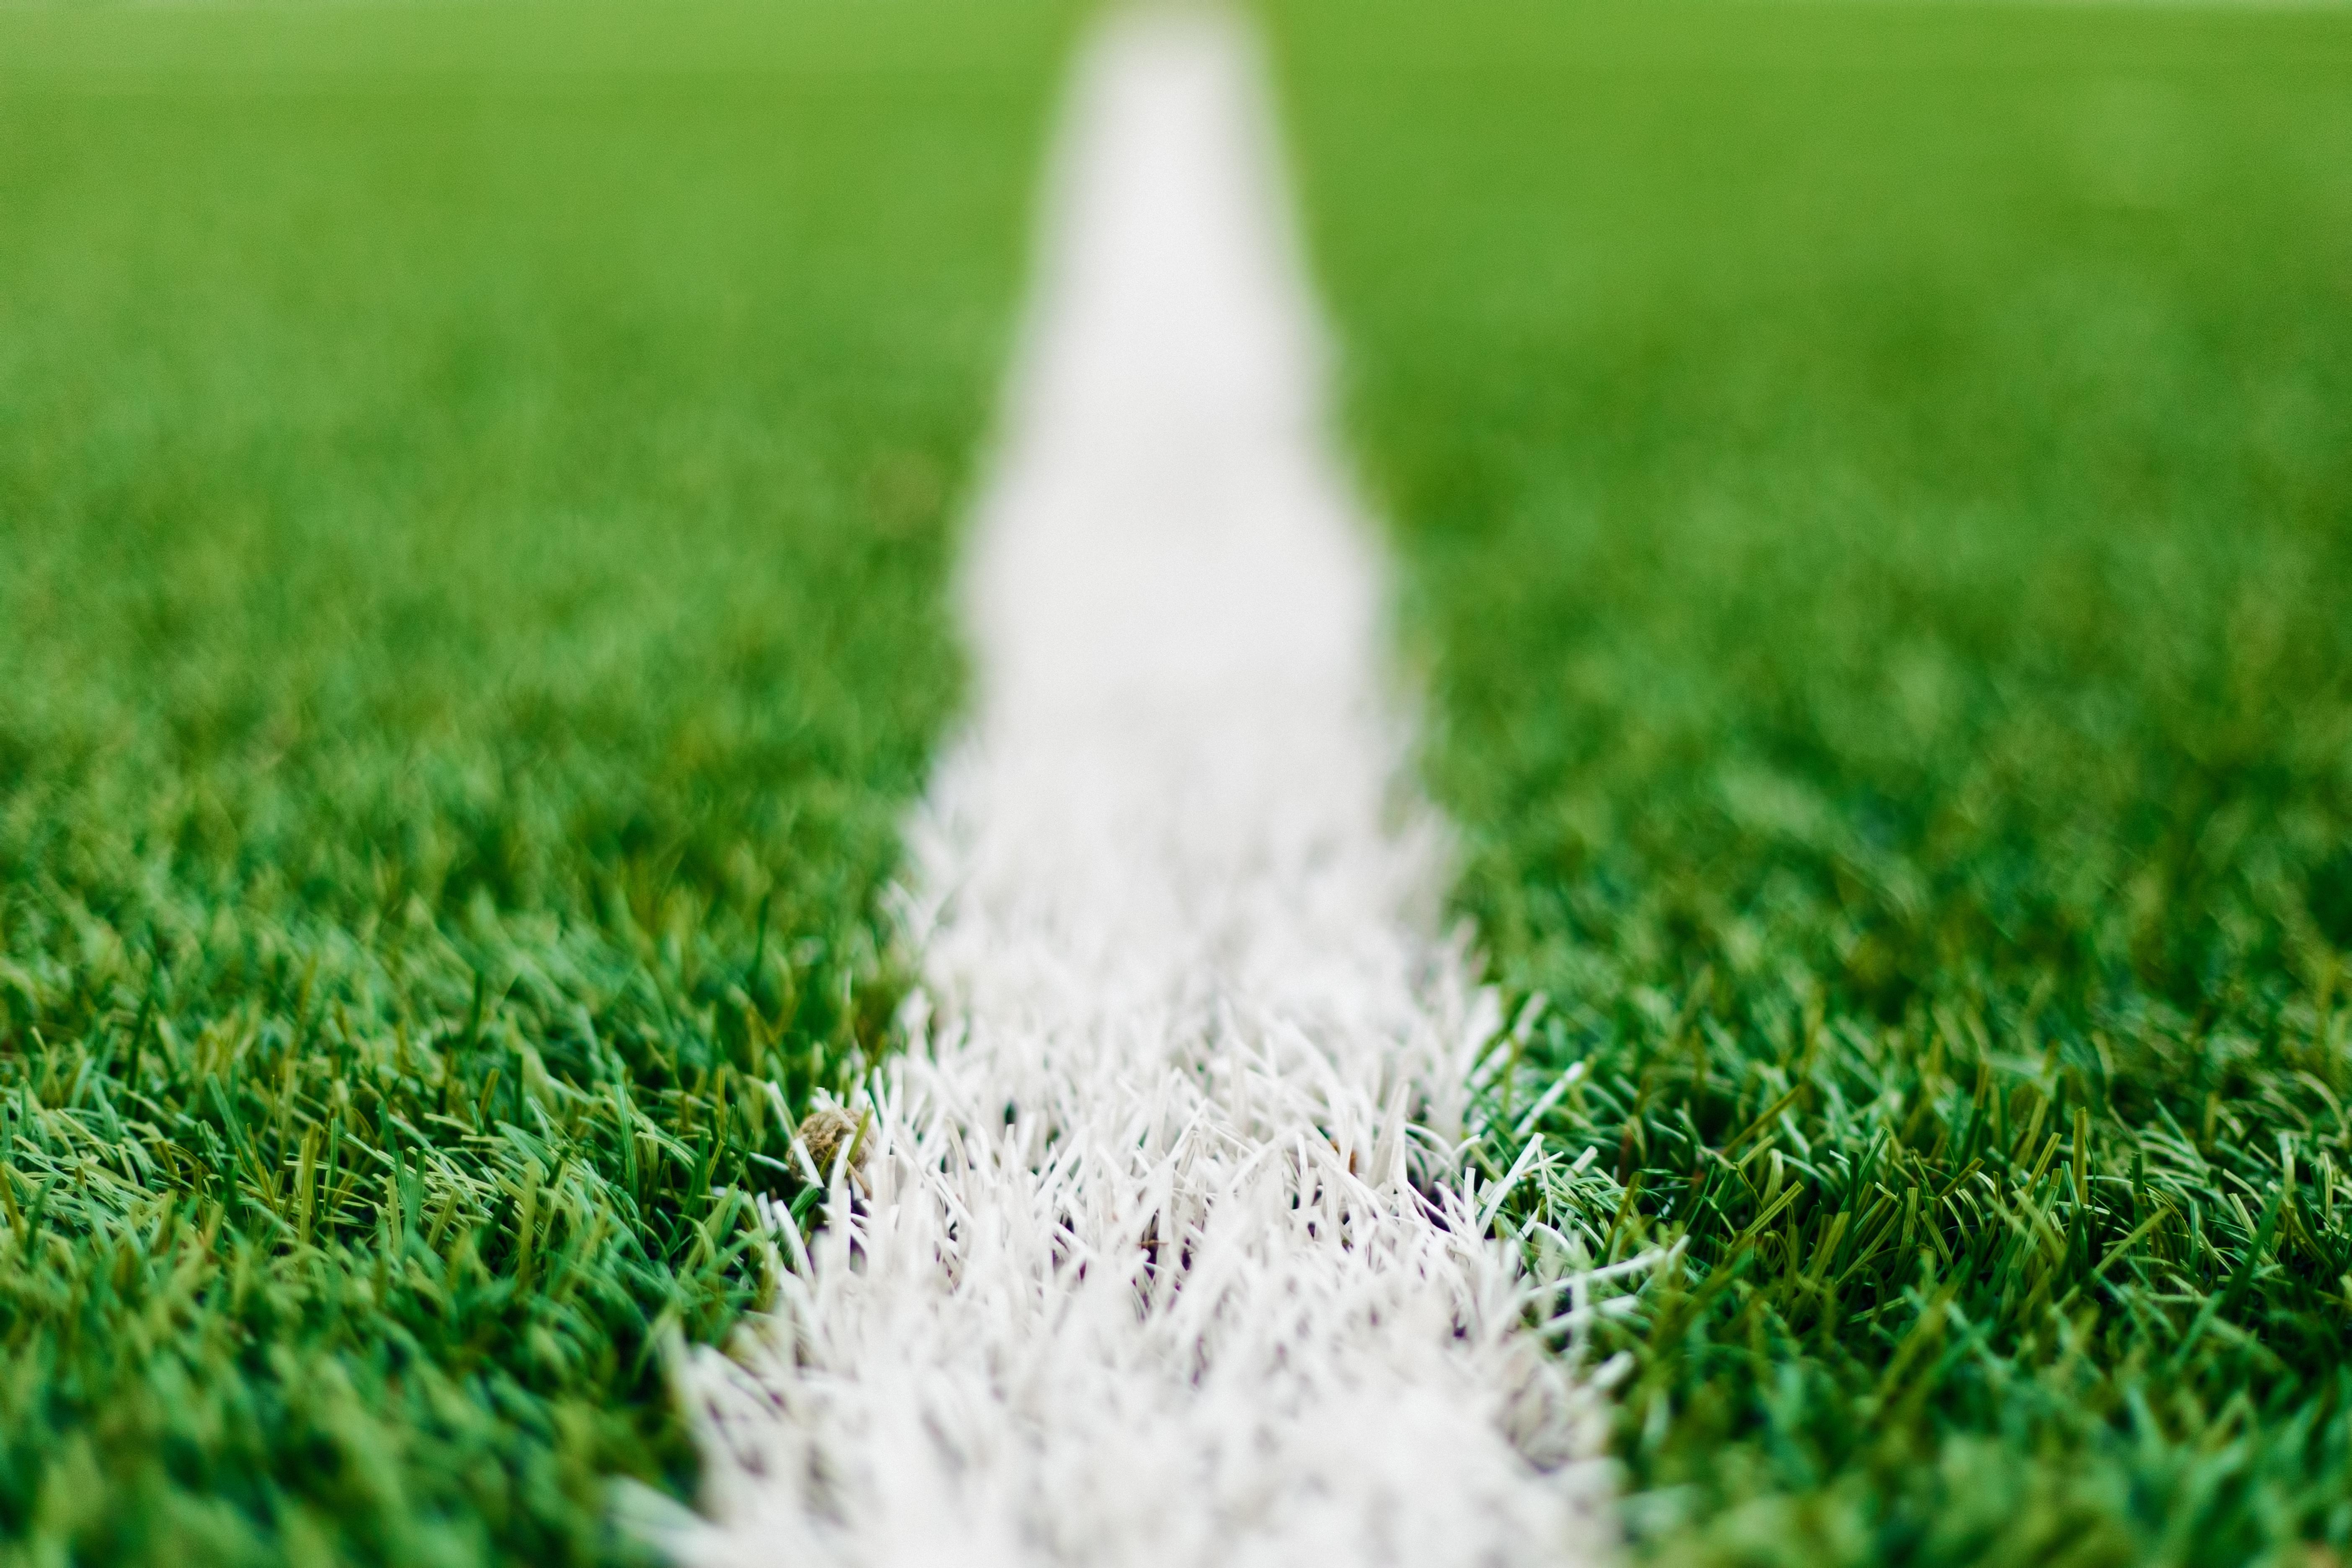 Soccer field grass hd free stock photos download 7465